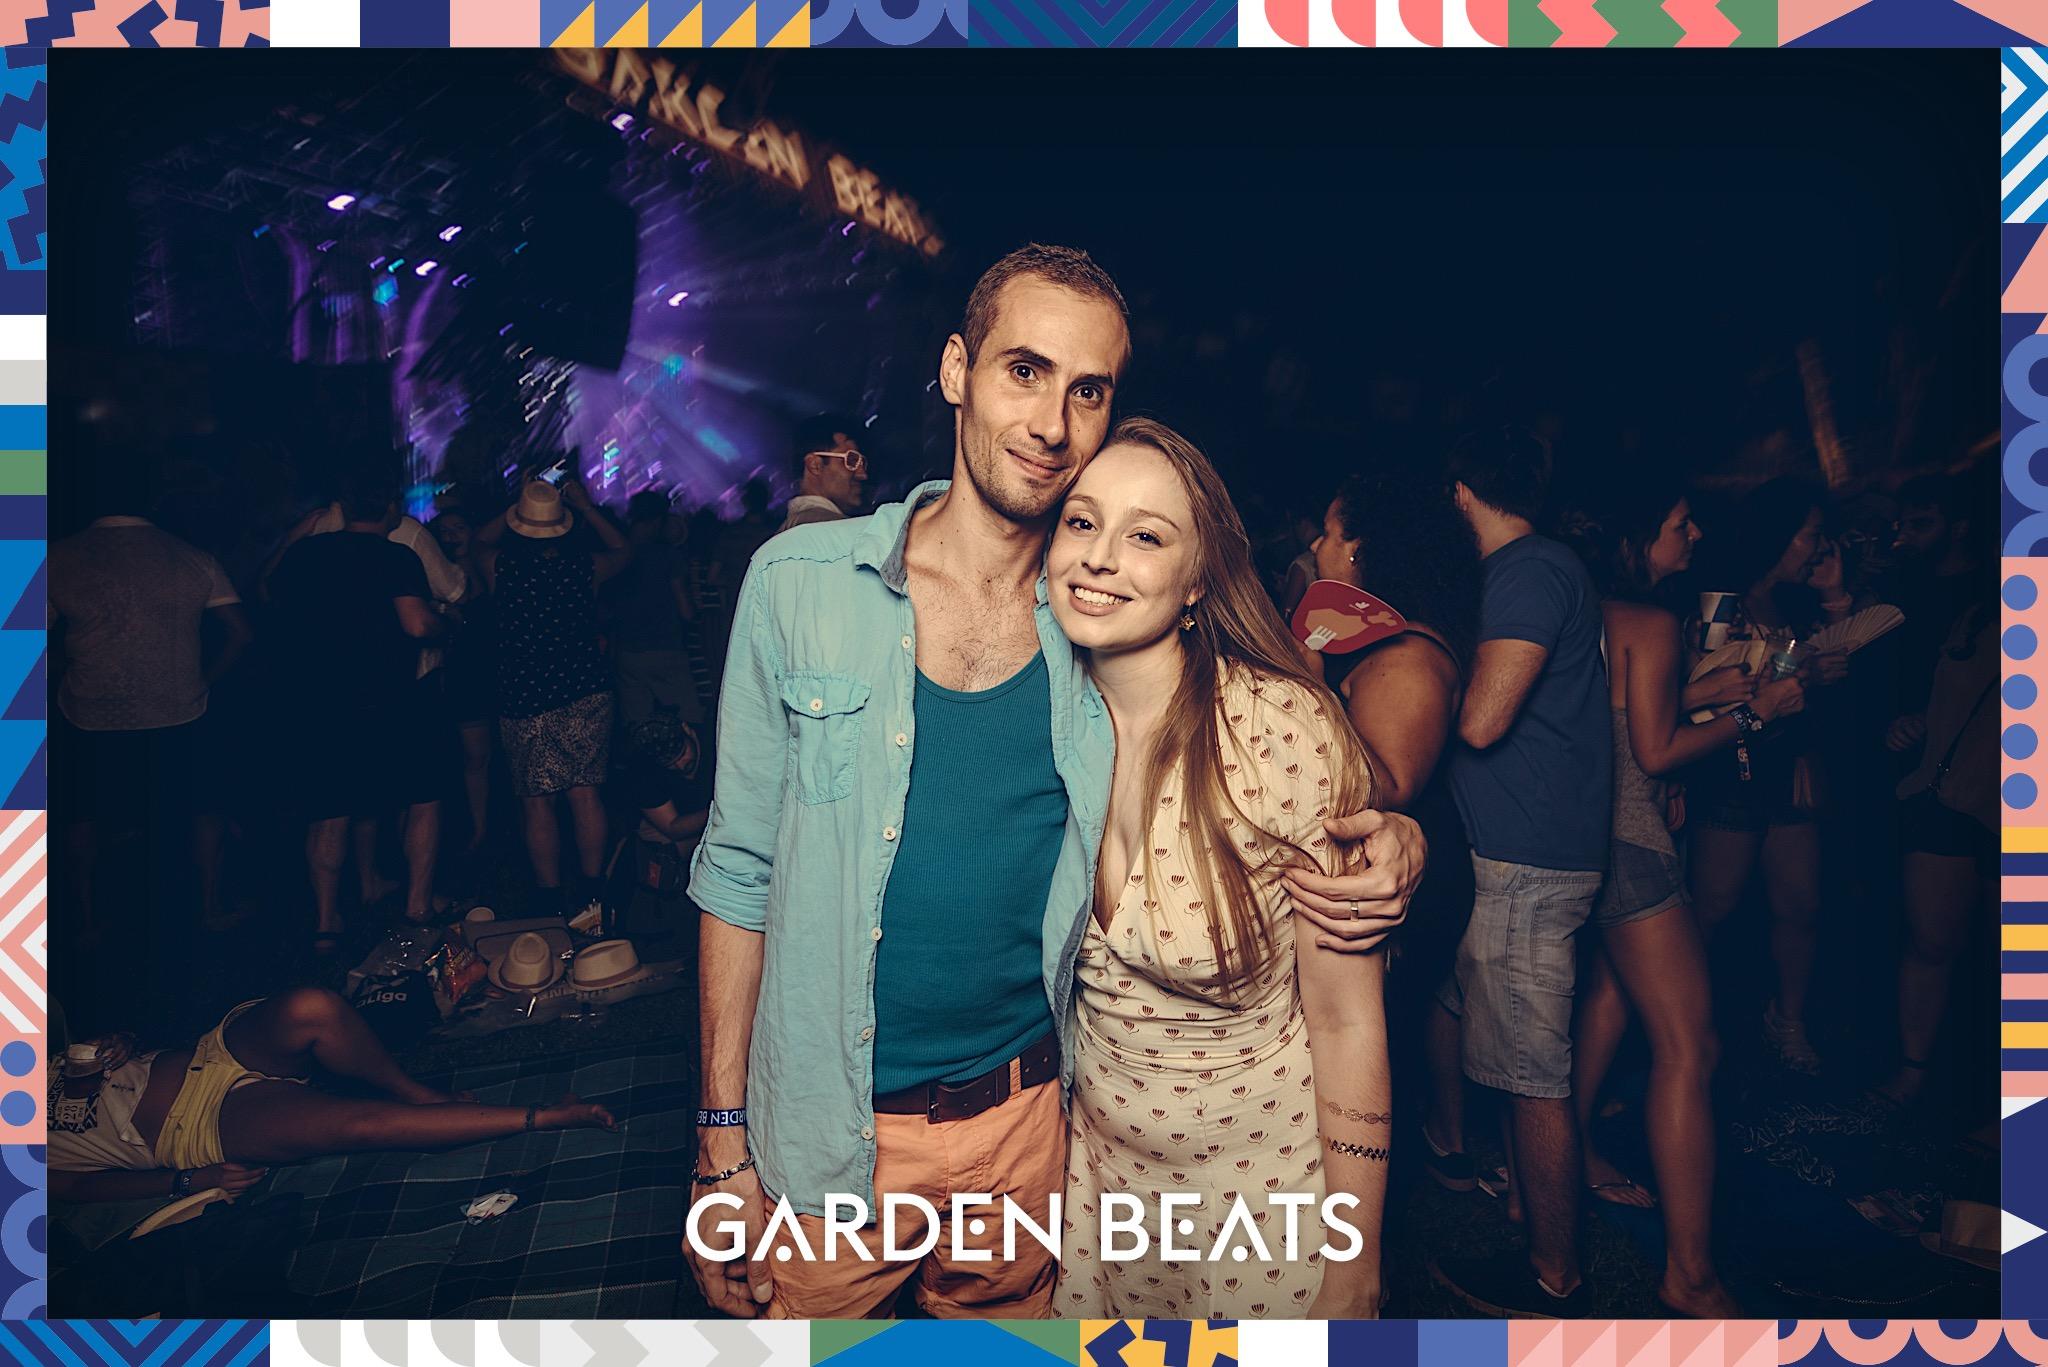 18032017_GardenBeats_Colossal730_WatermarkedGB.jpg